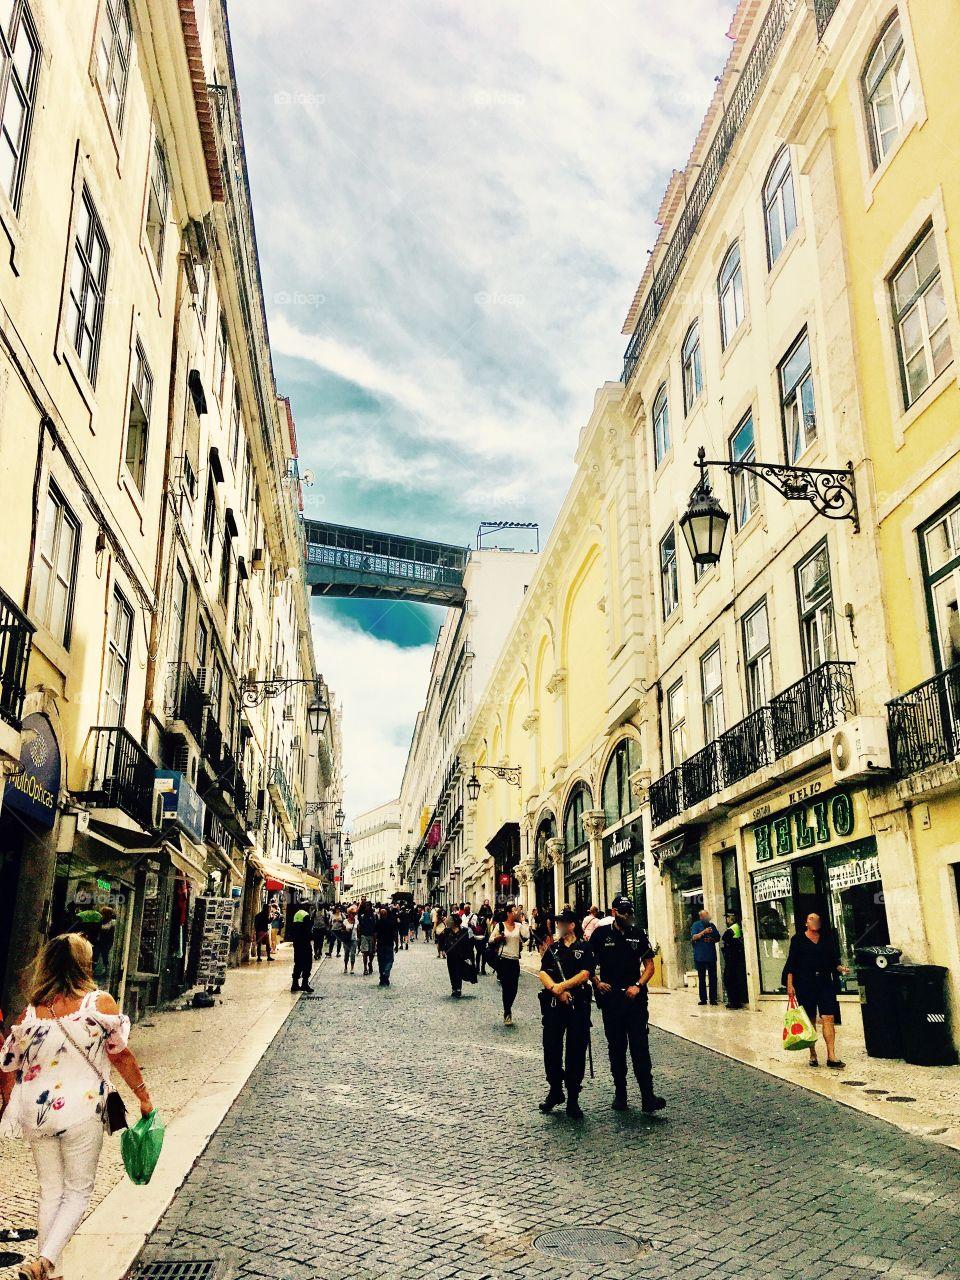 Shopping in Chiado - Lisbon